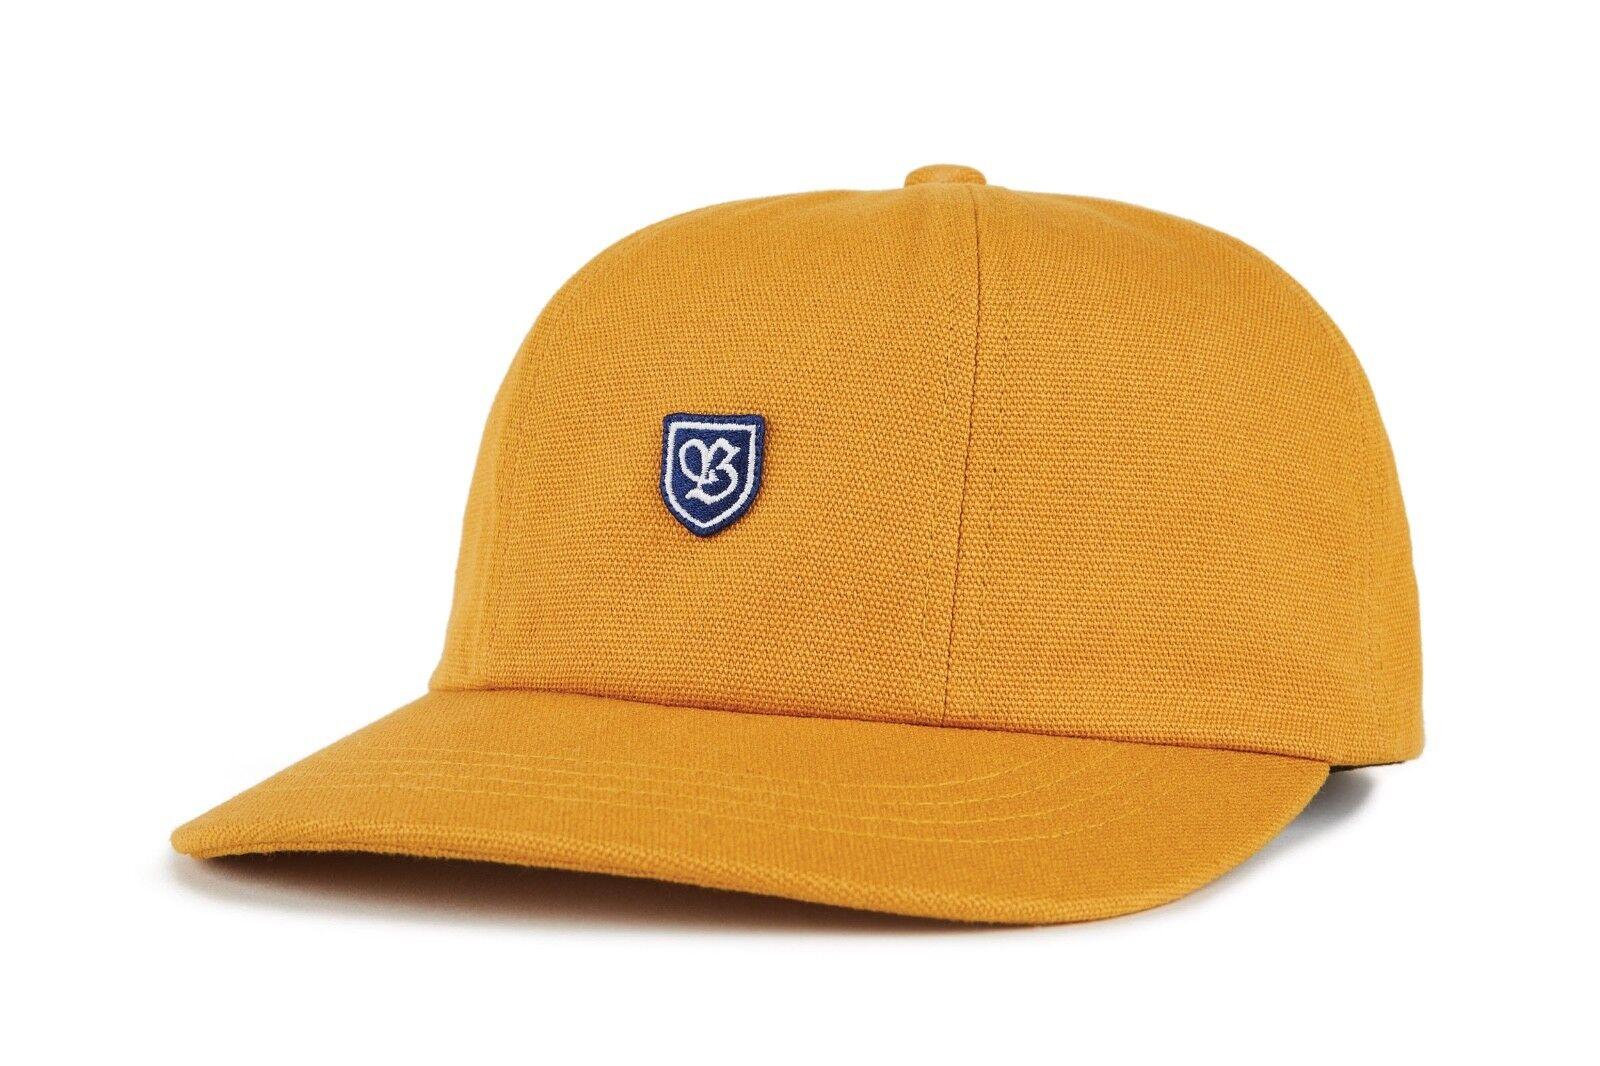 BRIXTON B SHIELD STRAPBACK CAP NEU GOLD BRIXTON SUPPLY